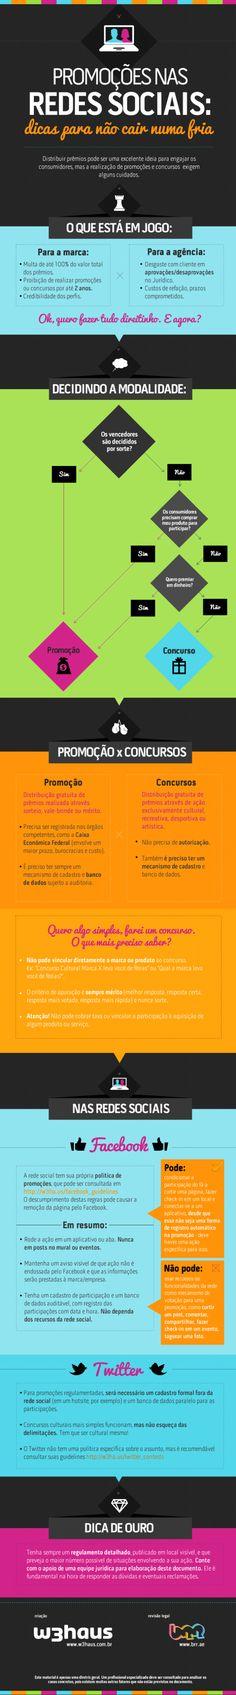 infografico_promocoes_redes_sociais_w3haus_br_20121